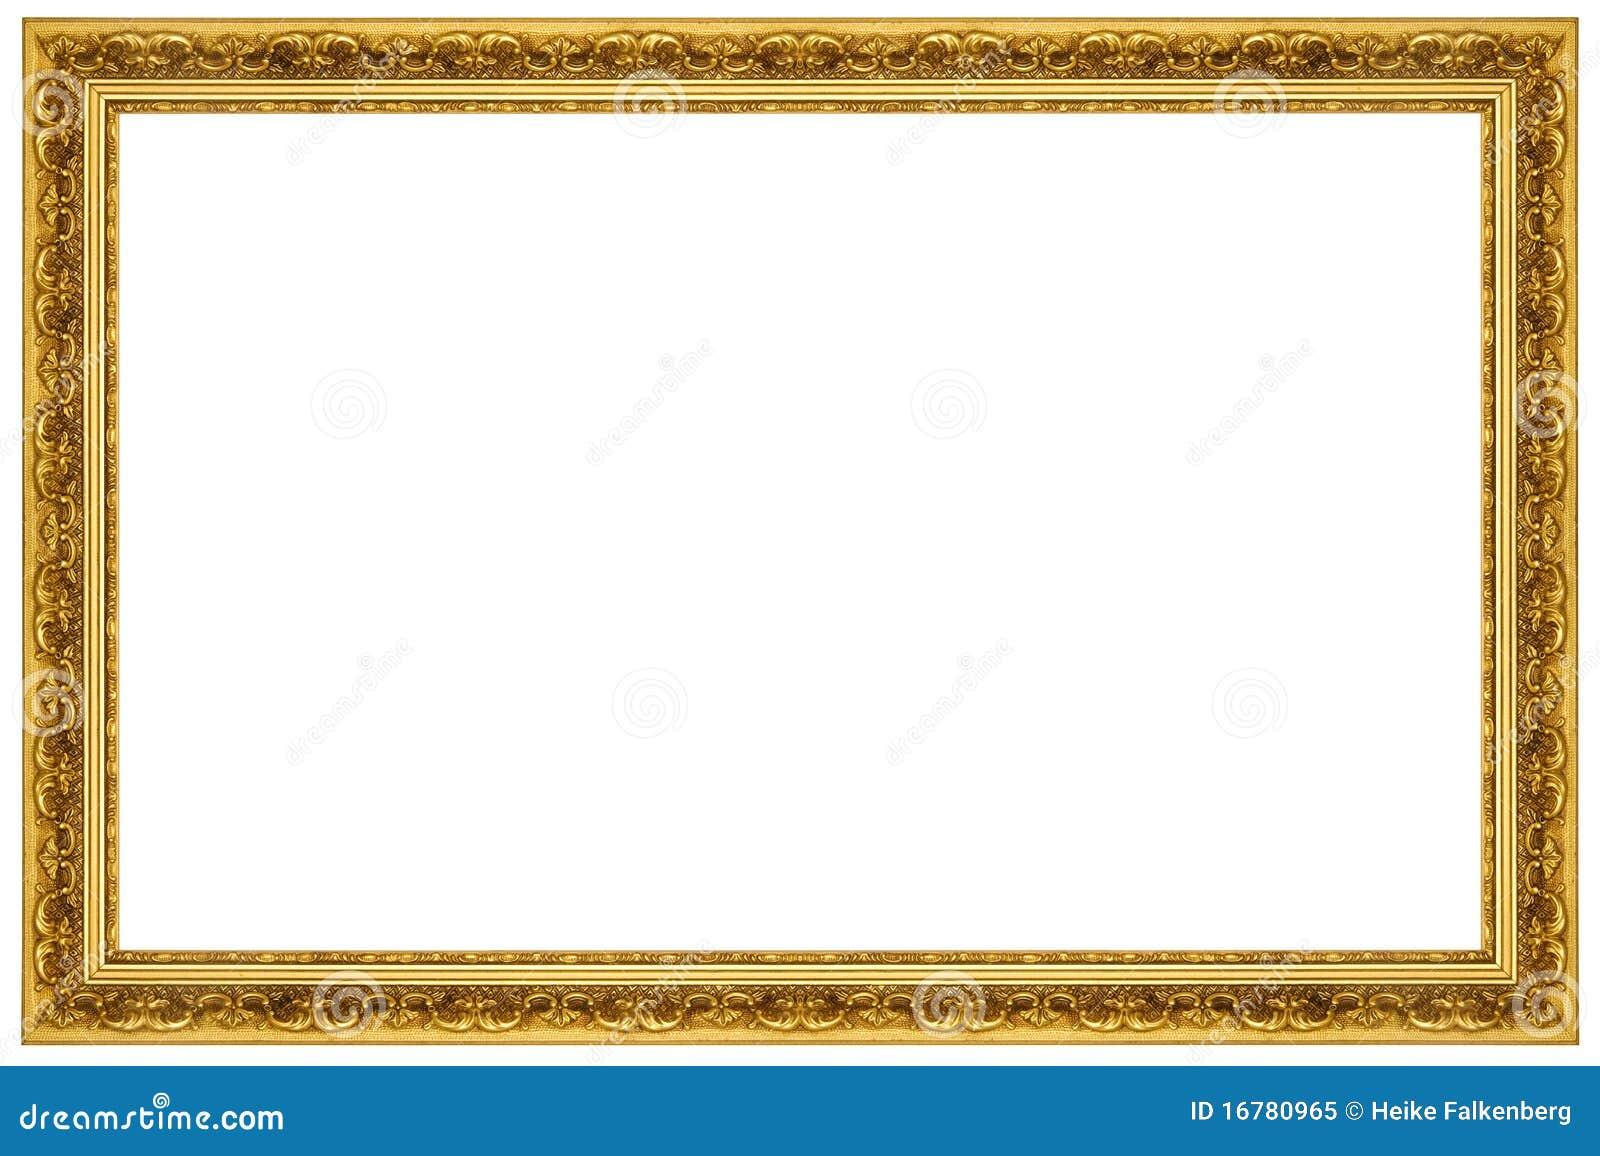 Cadre de tableau fleuri d 39 or photo libre de droits image - Image de cadre de tableau ...